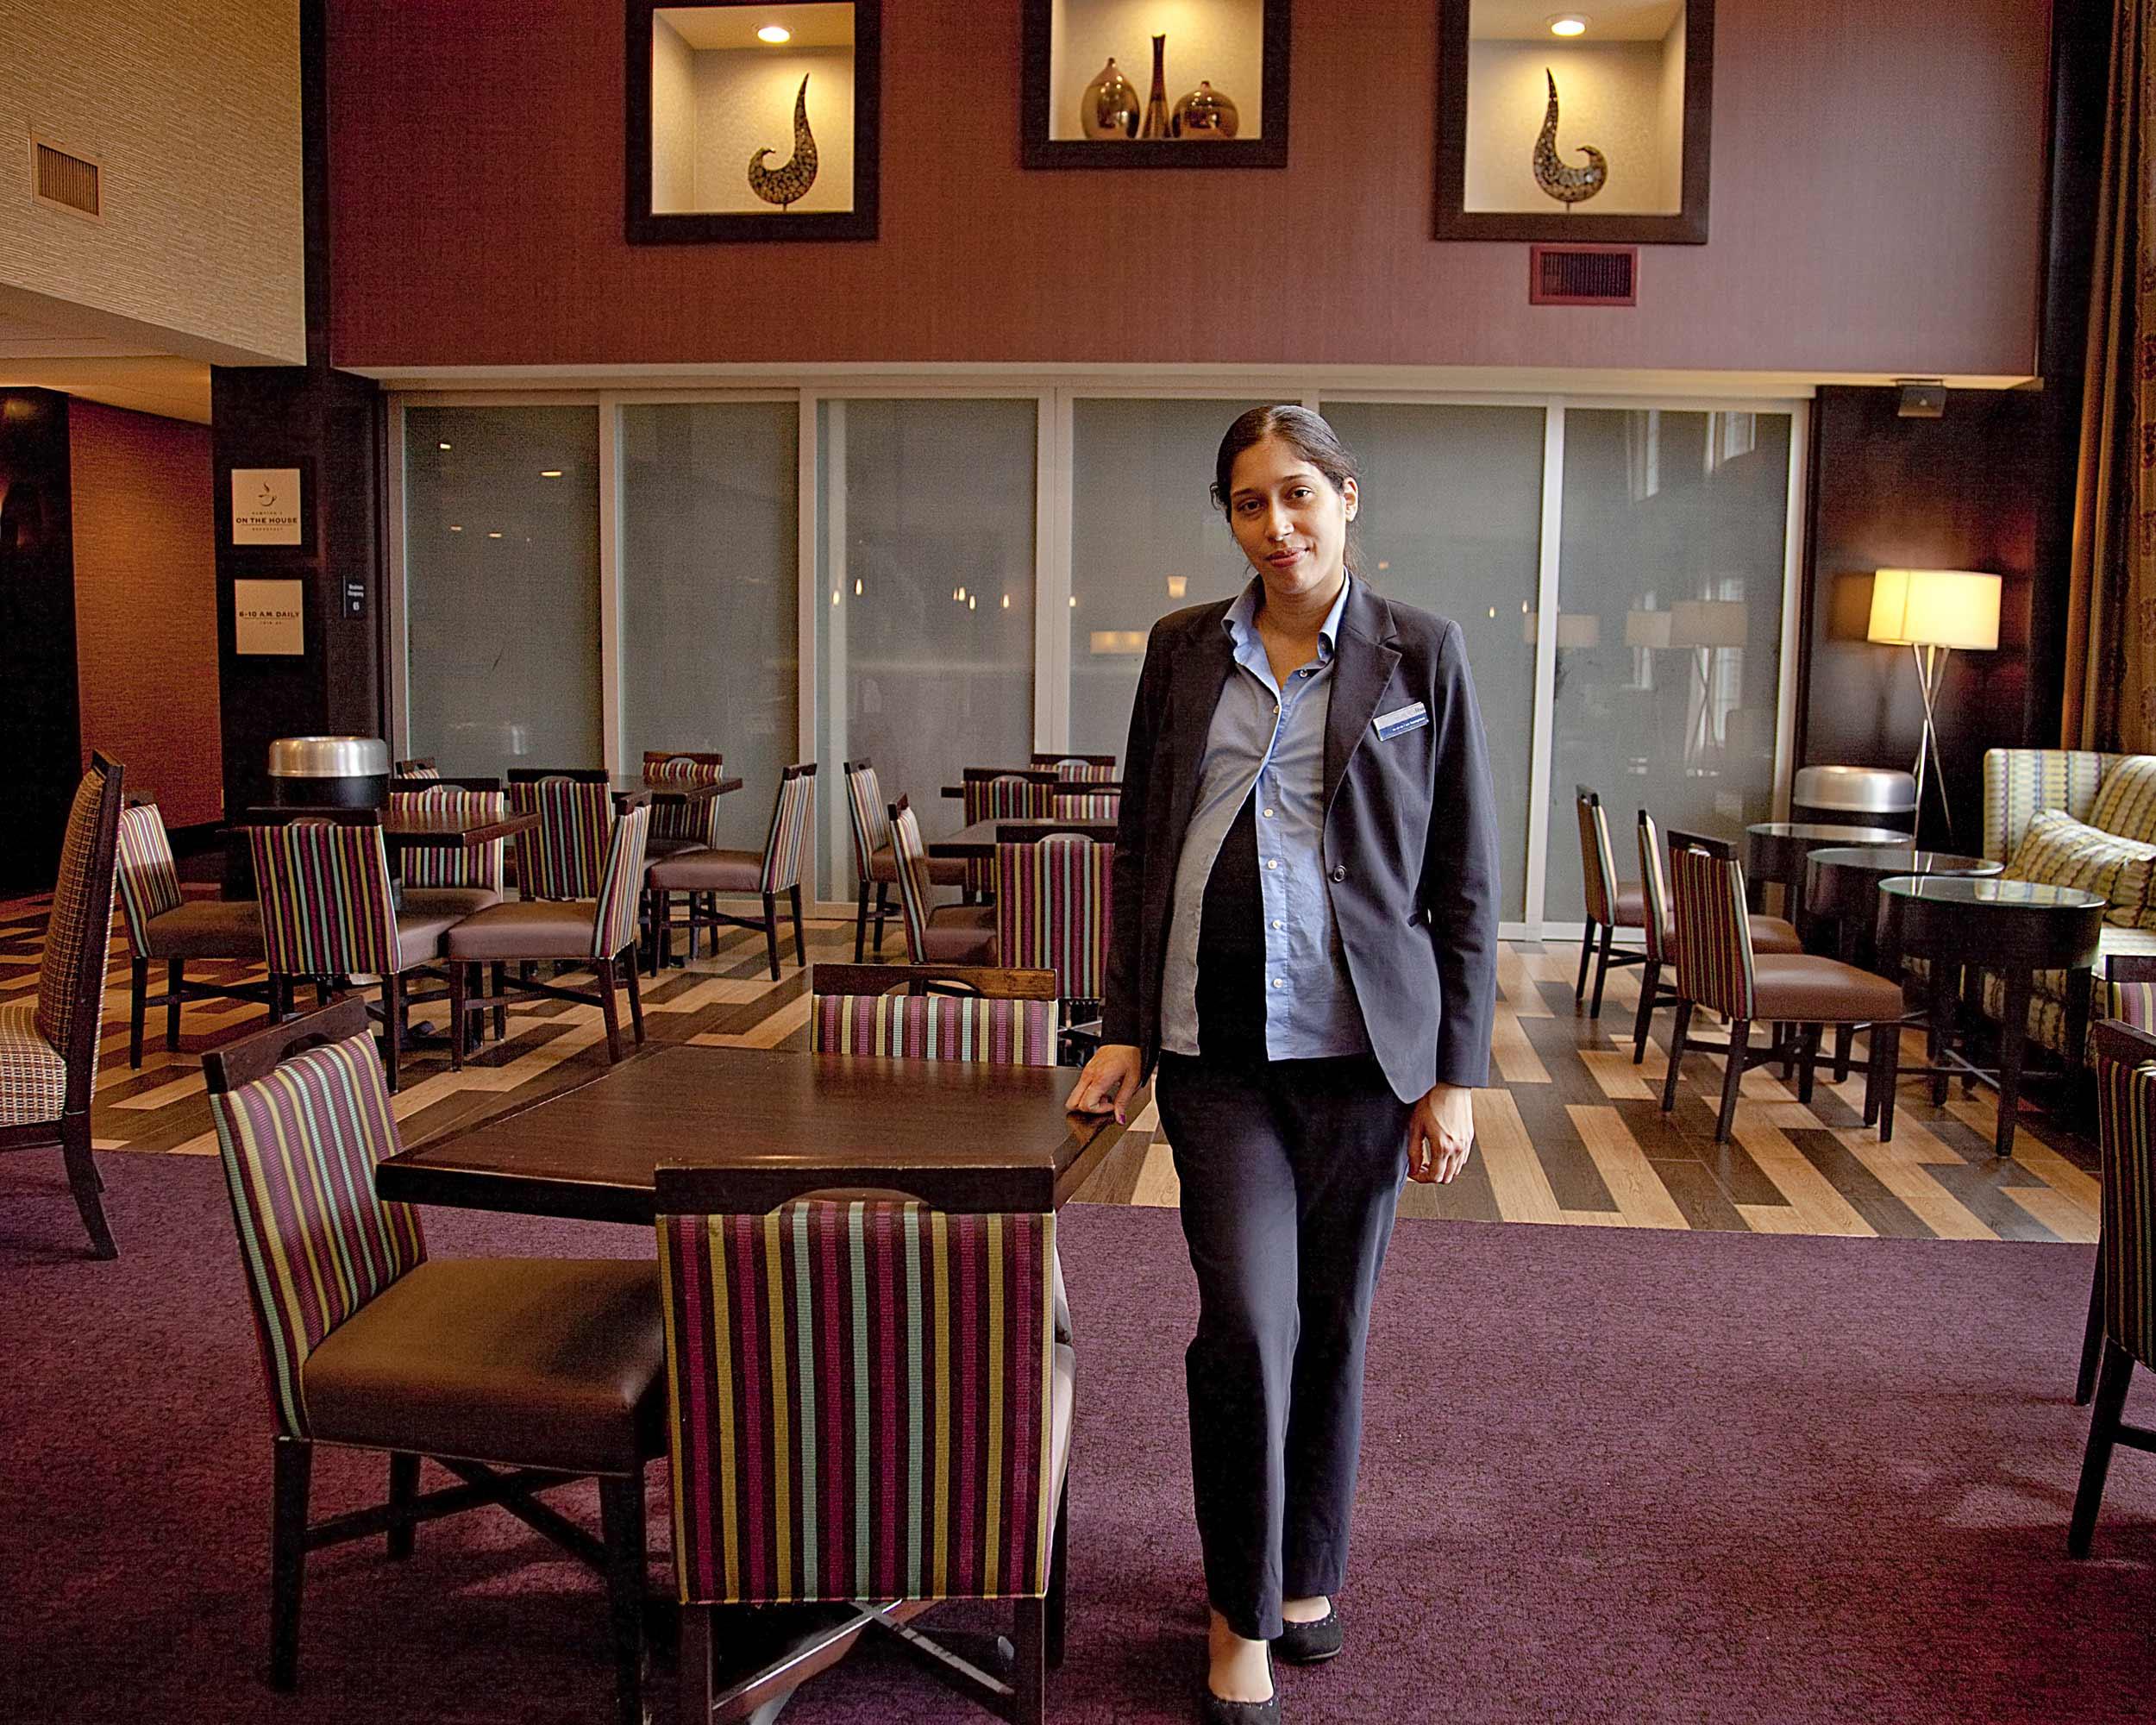 Lisa, Hotel Clerk - Mary Frey, 2012, © Mary Frey